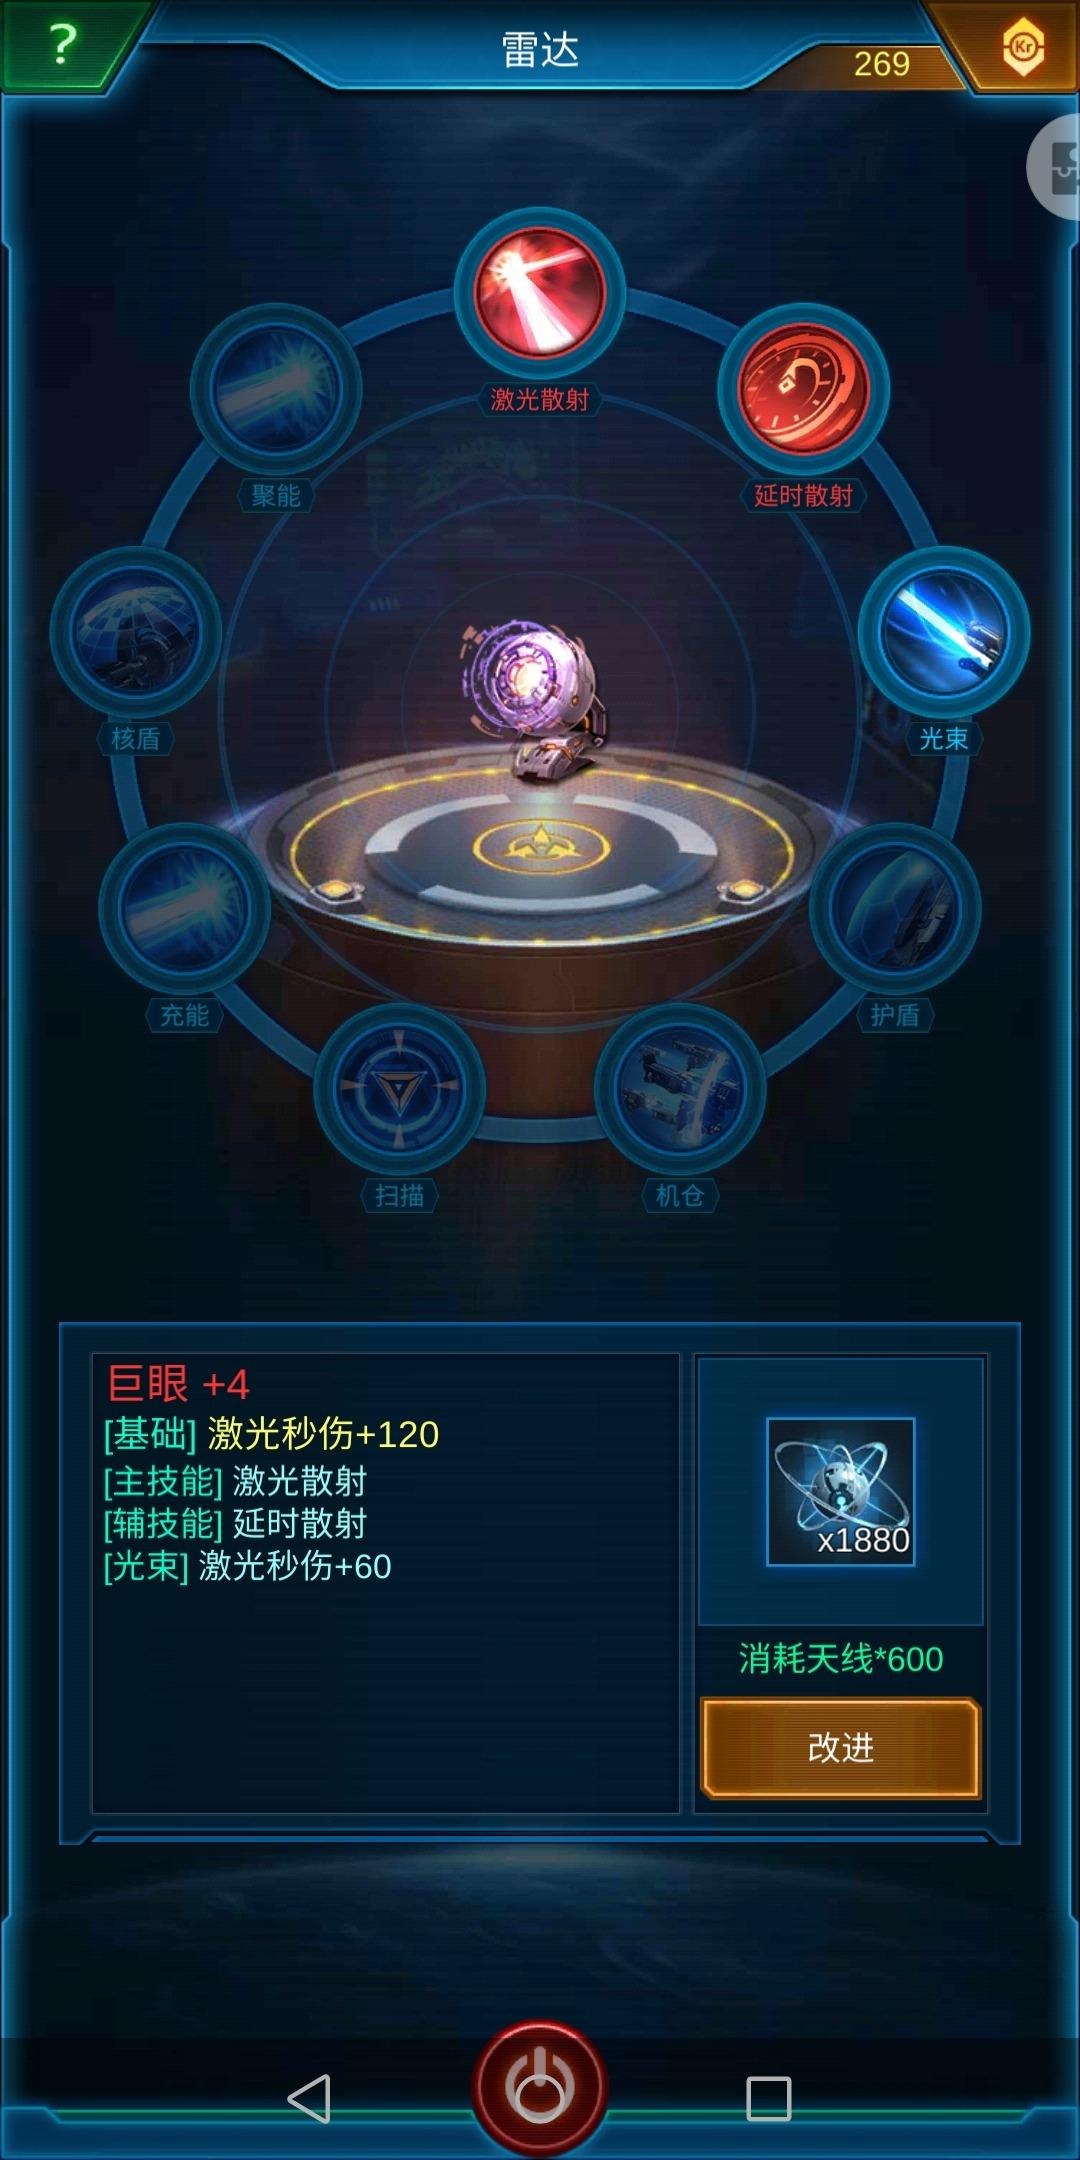 Screenshot_20200303_102706_com.jedigames.p16s.huawei.jpg